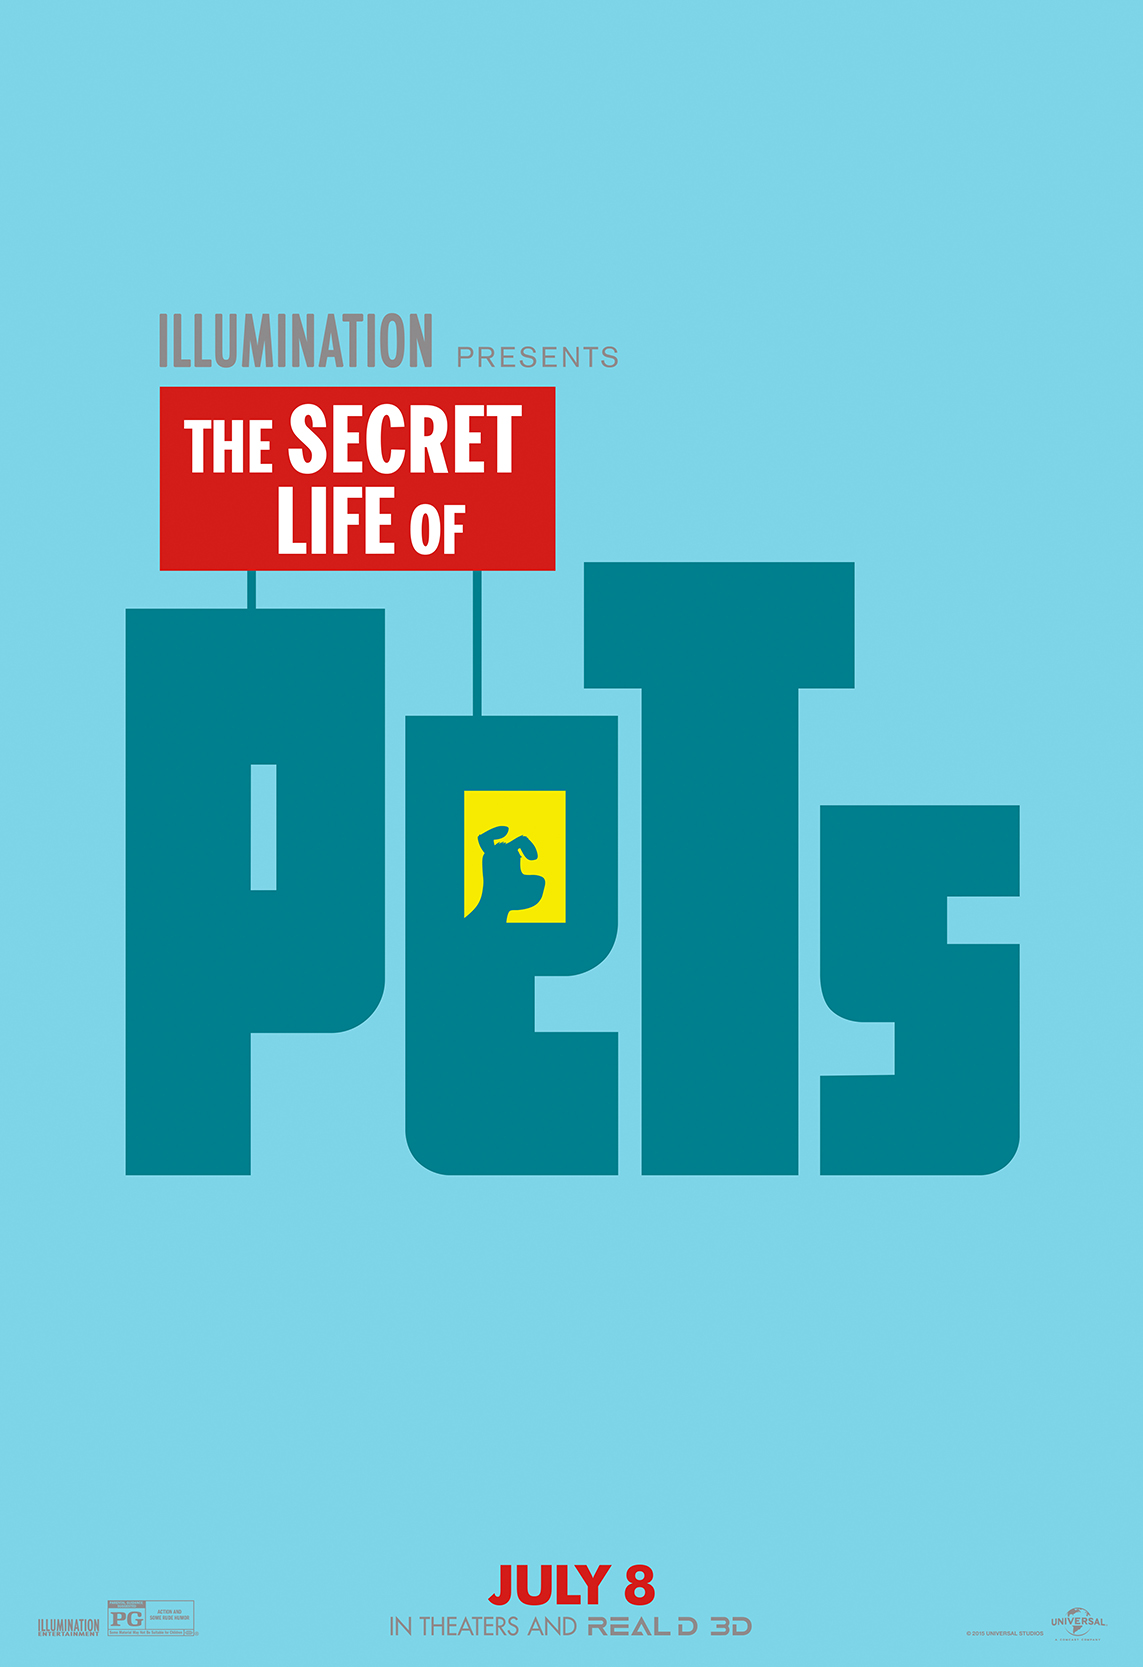 Pets_Wildpost_DateTitle_100dpi.jpg